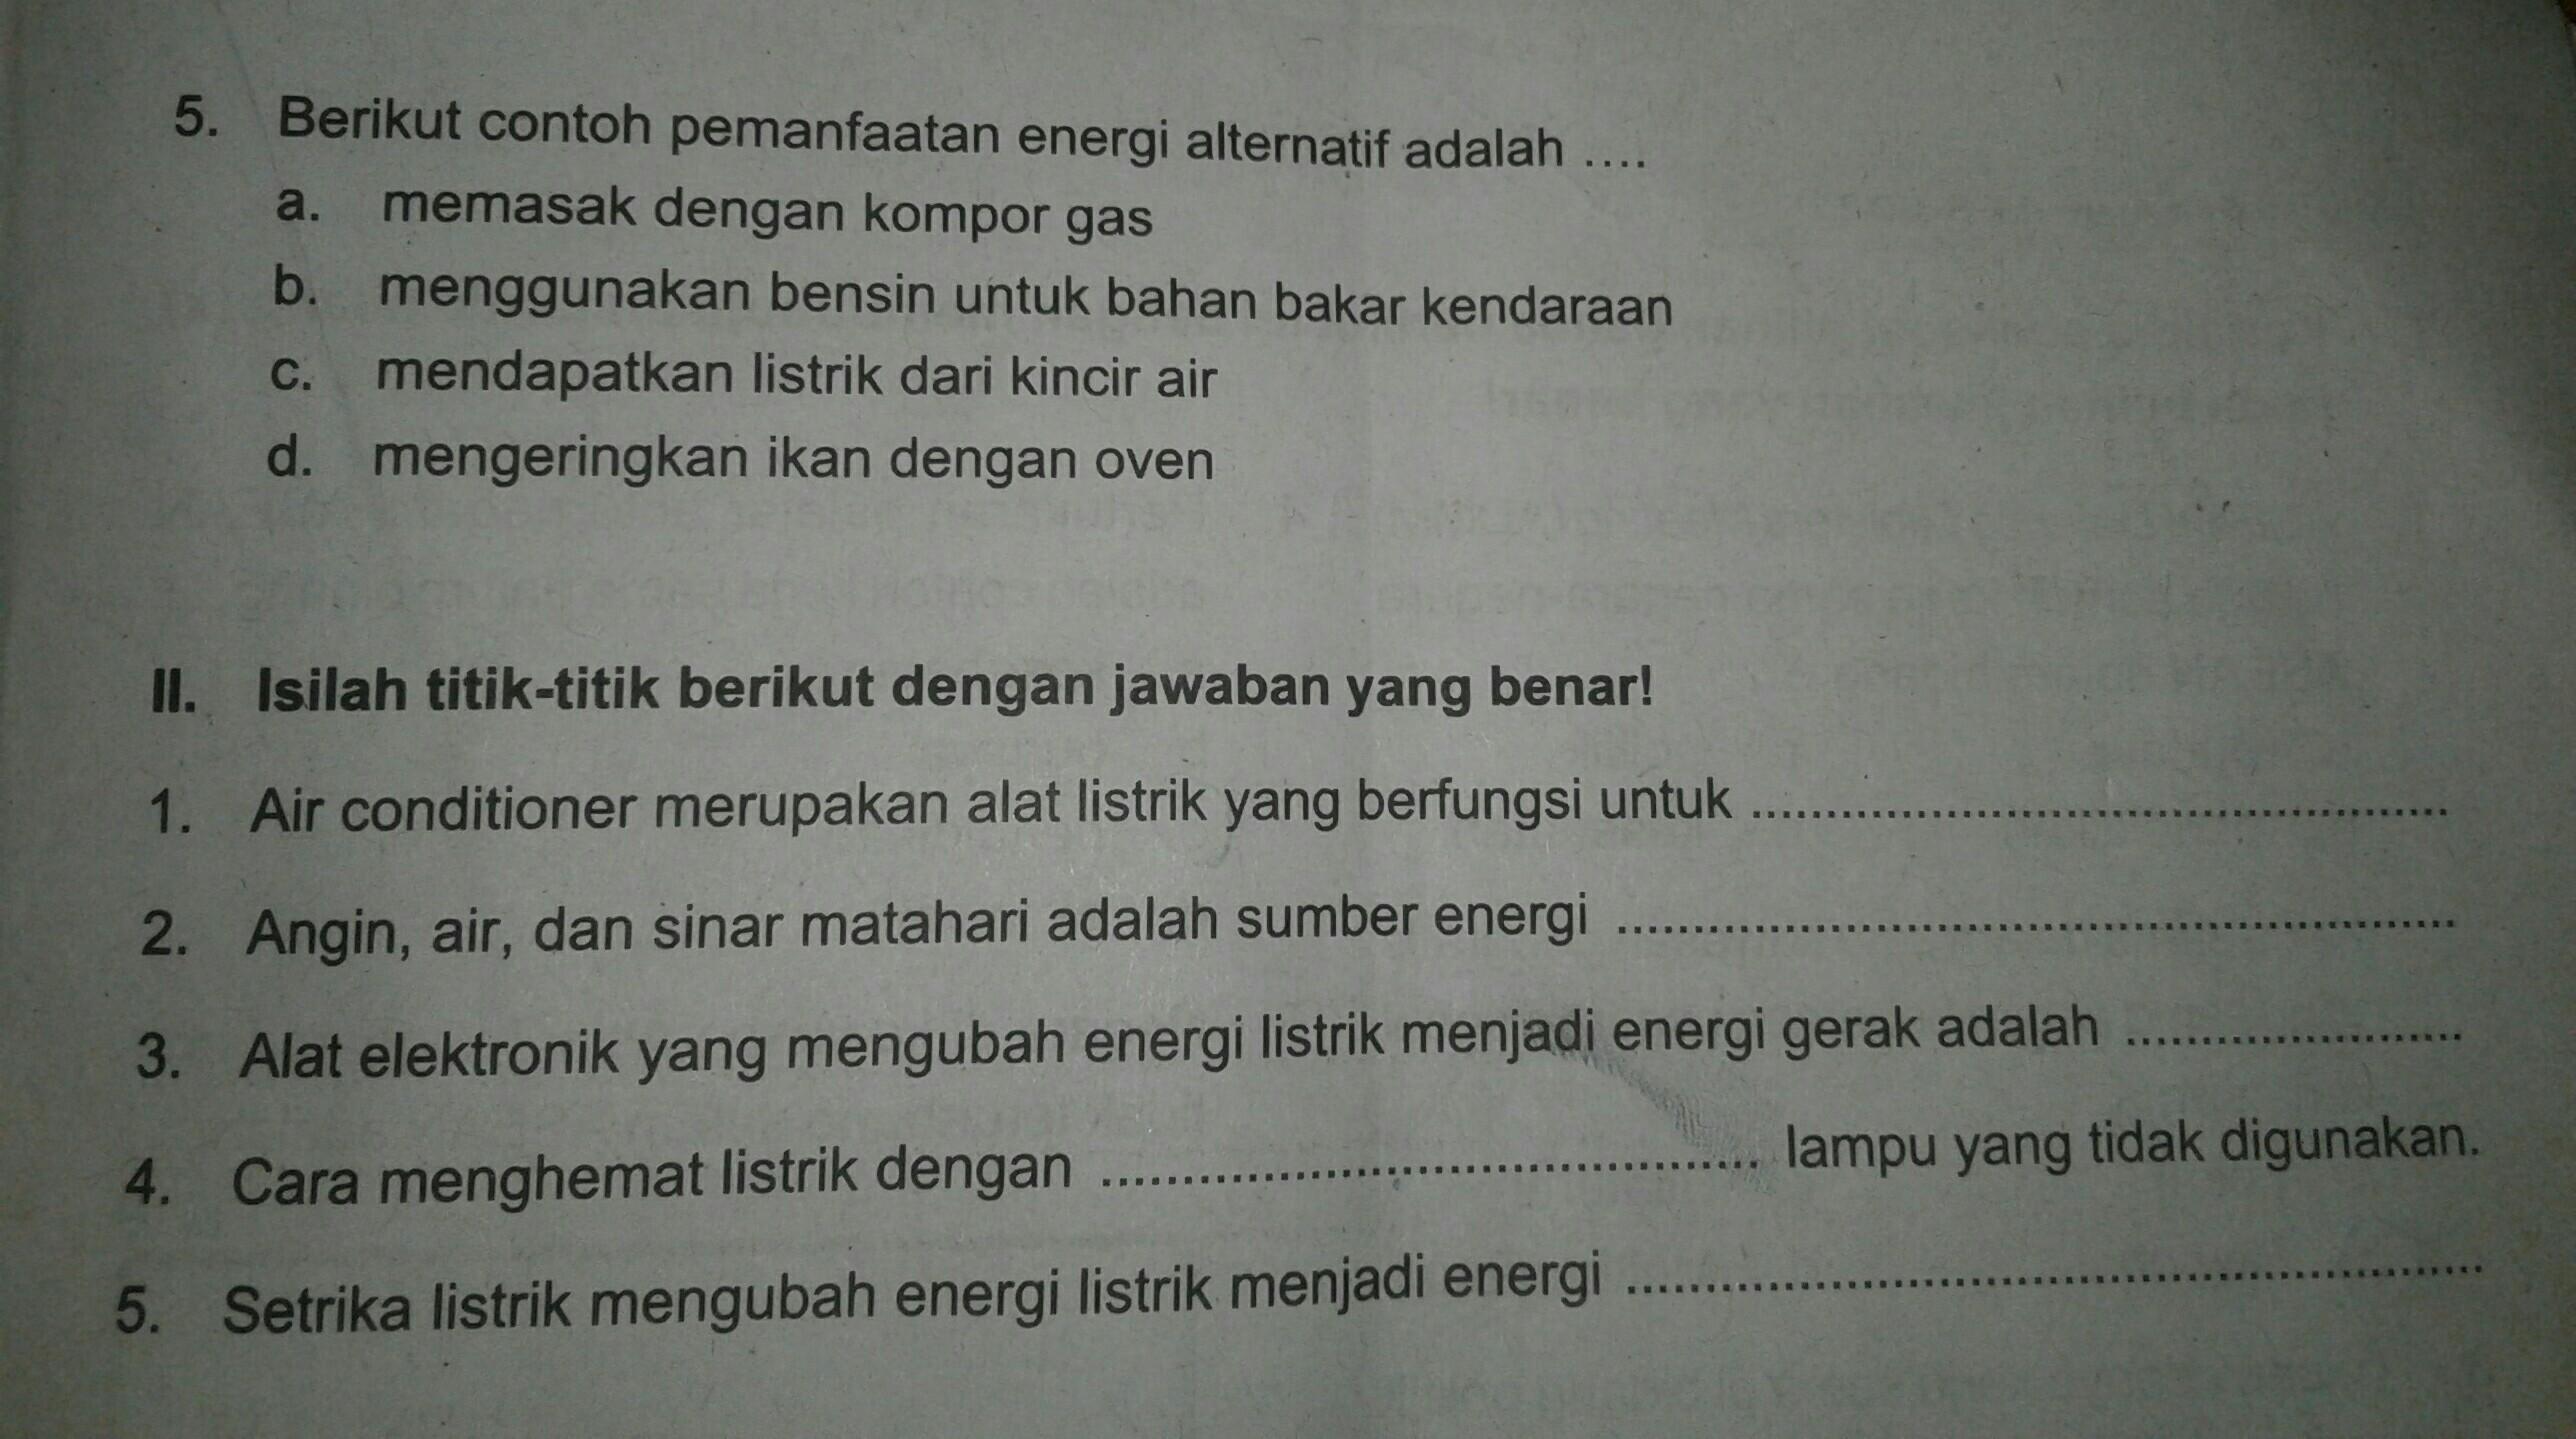 Tolong Jawab Yang Bisa Aja Ya Kak Jawab Yang Kakak Bisa Aja